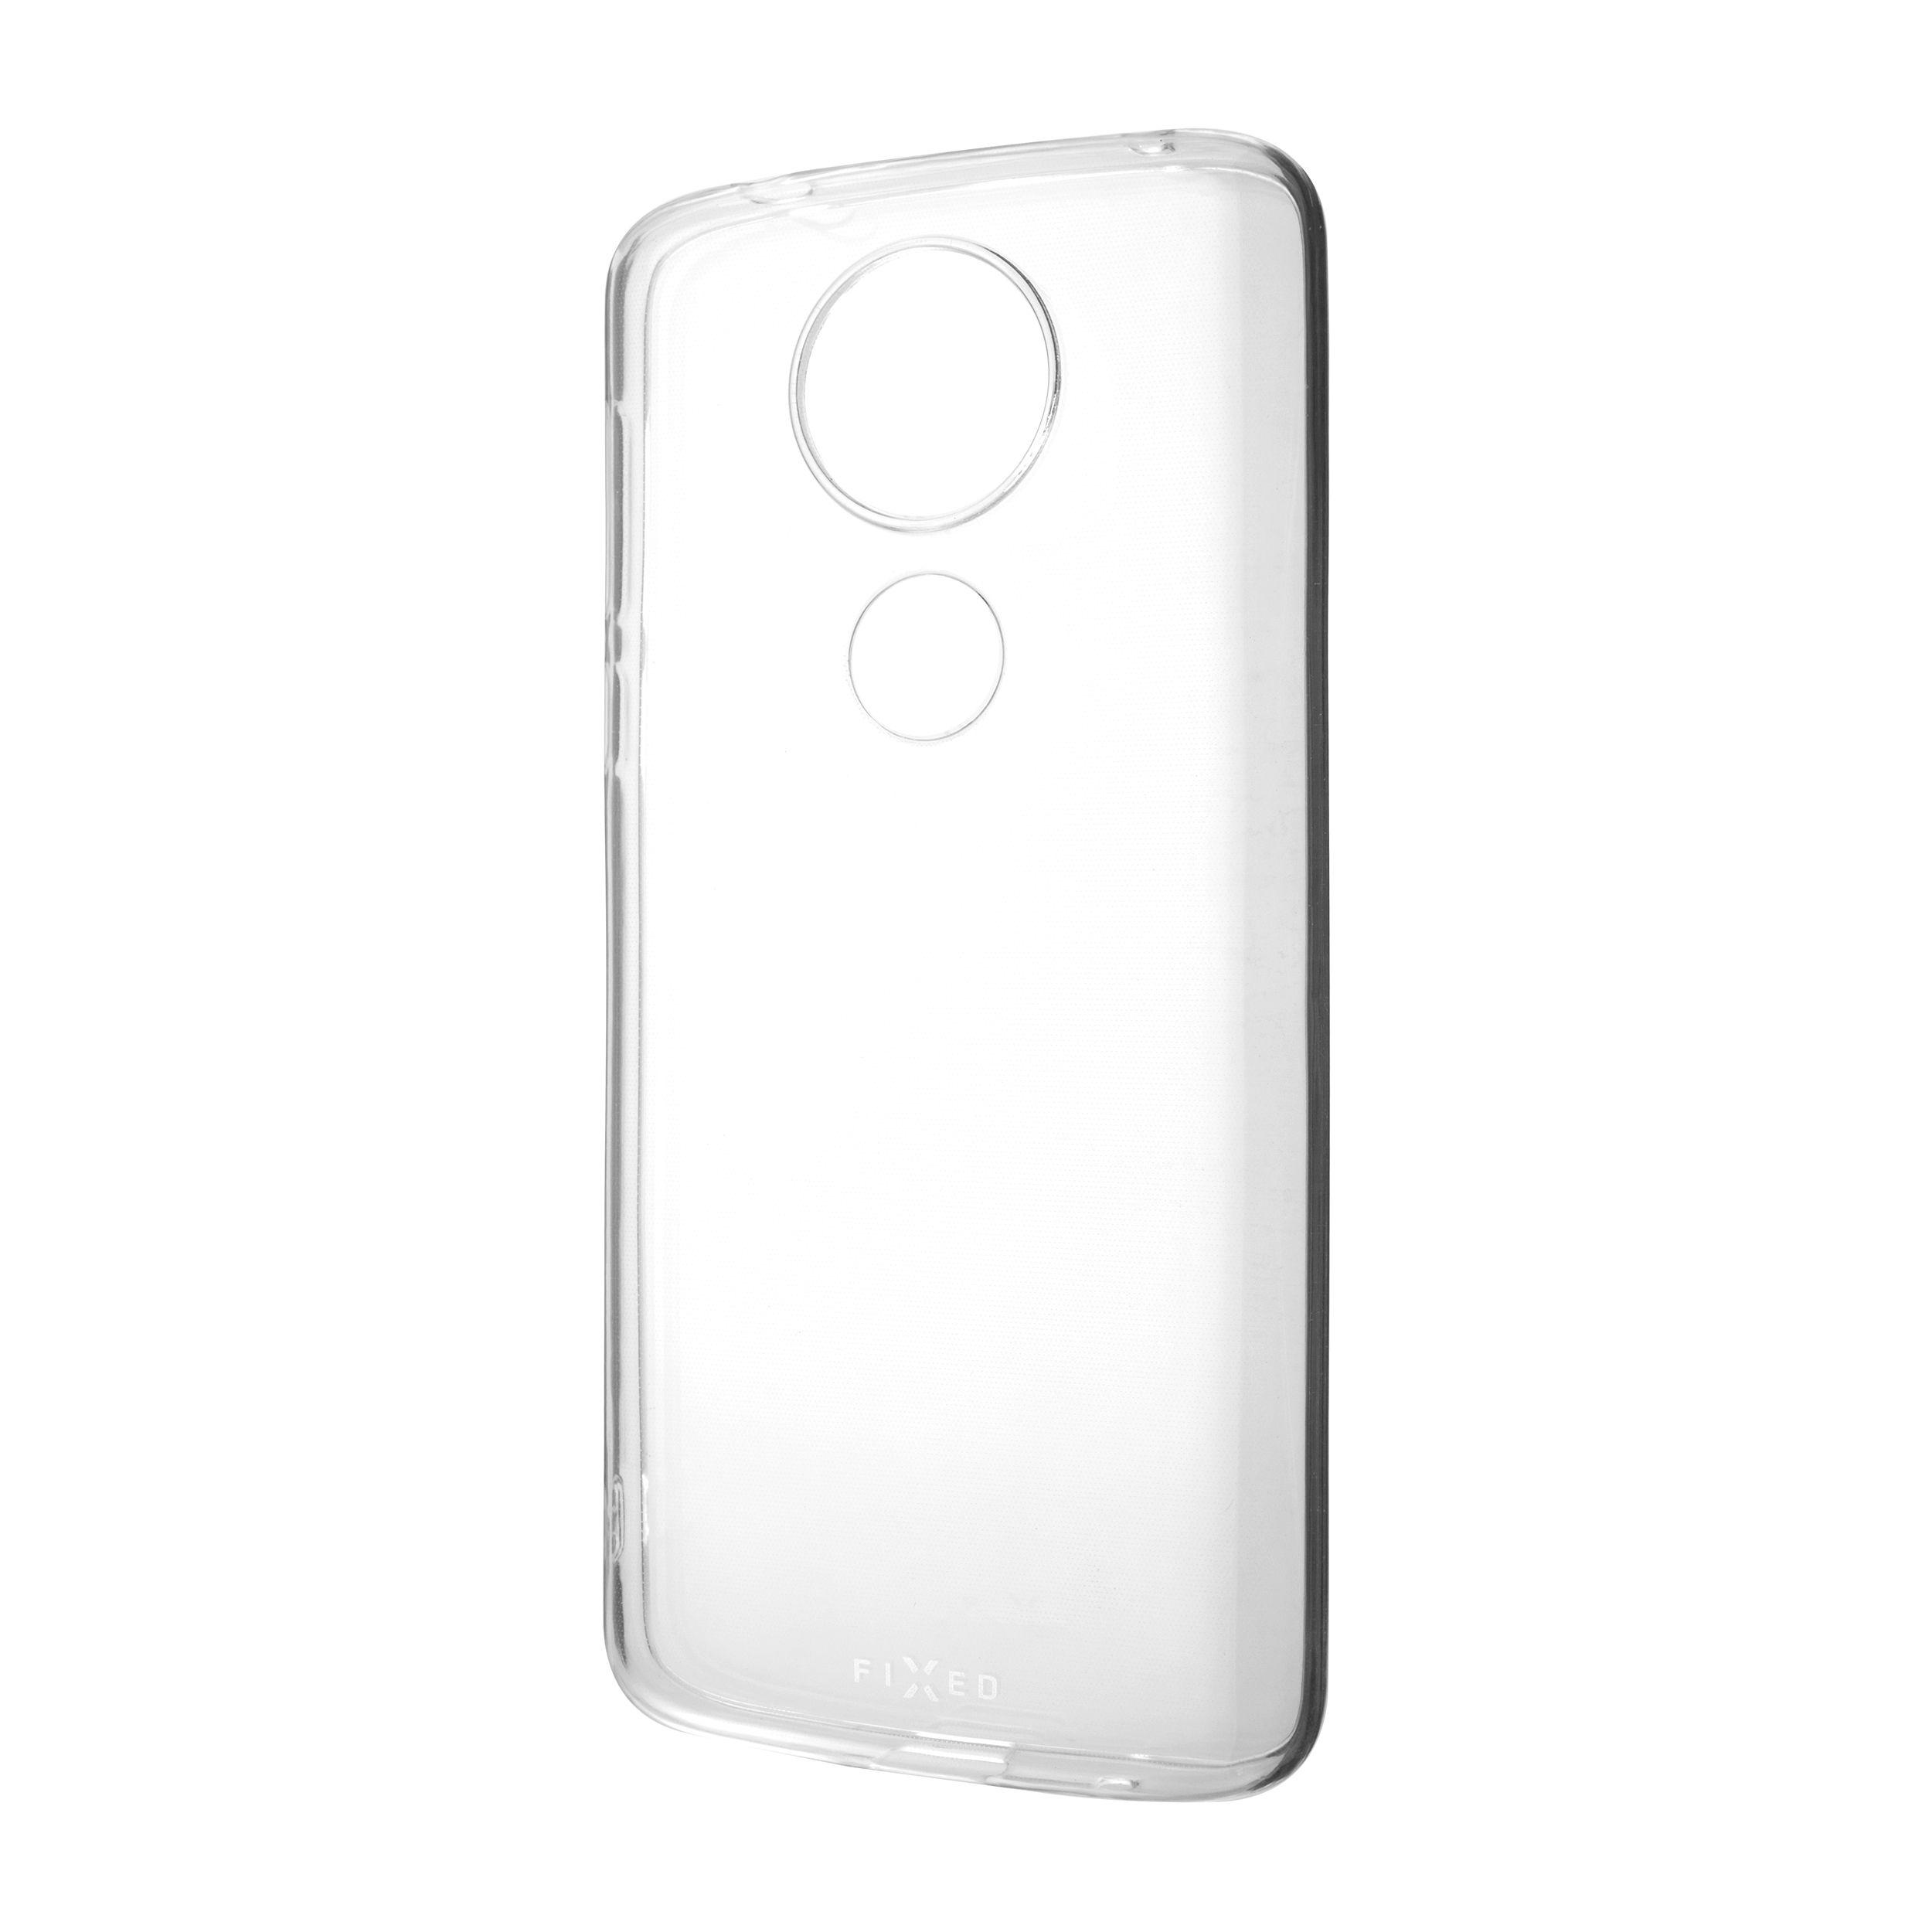 TPU gelové pouzdro FIXED pro Motorola Moto G6 Play, čiré